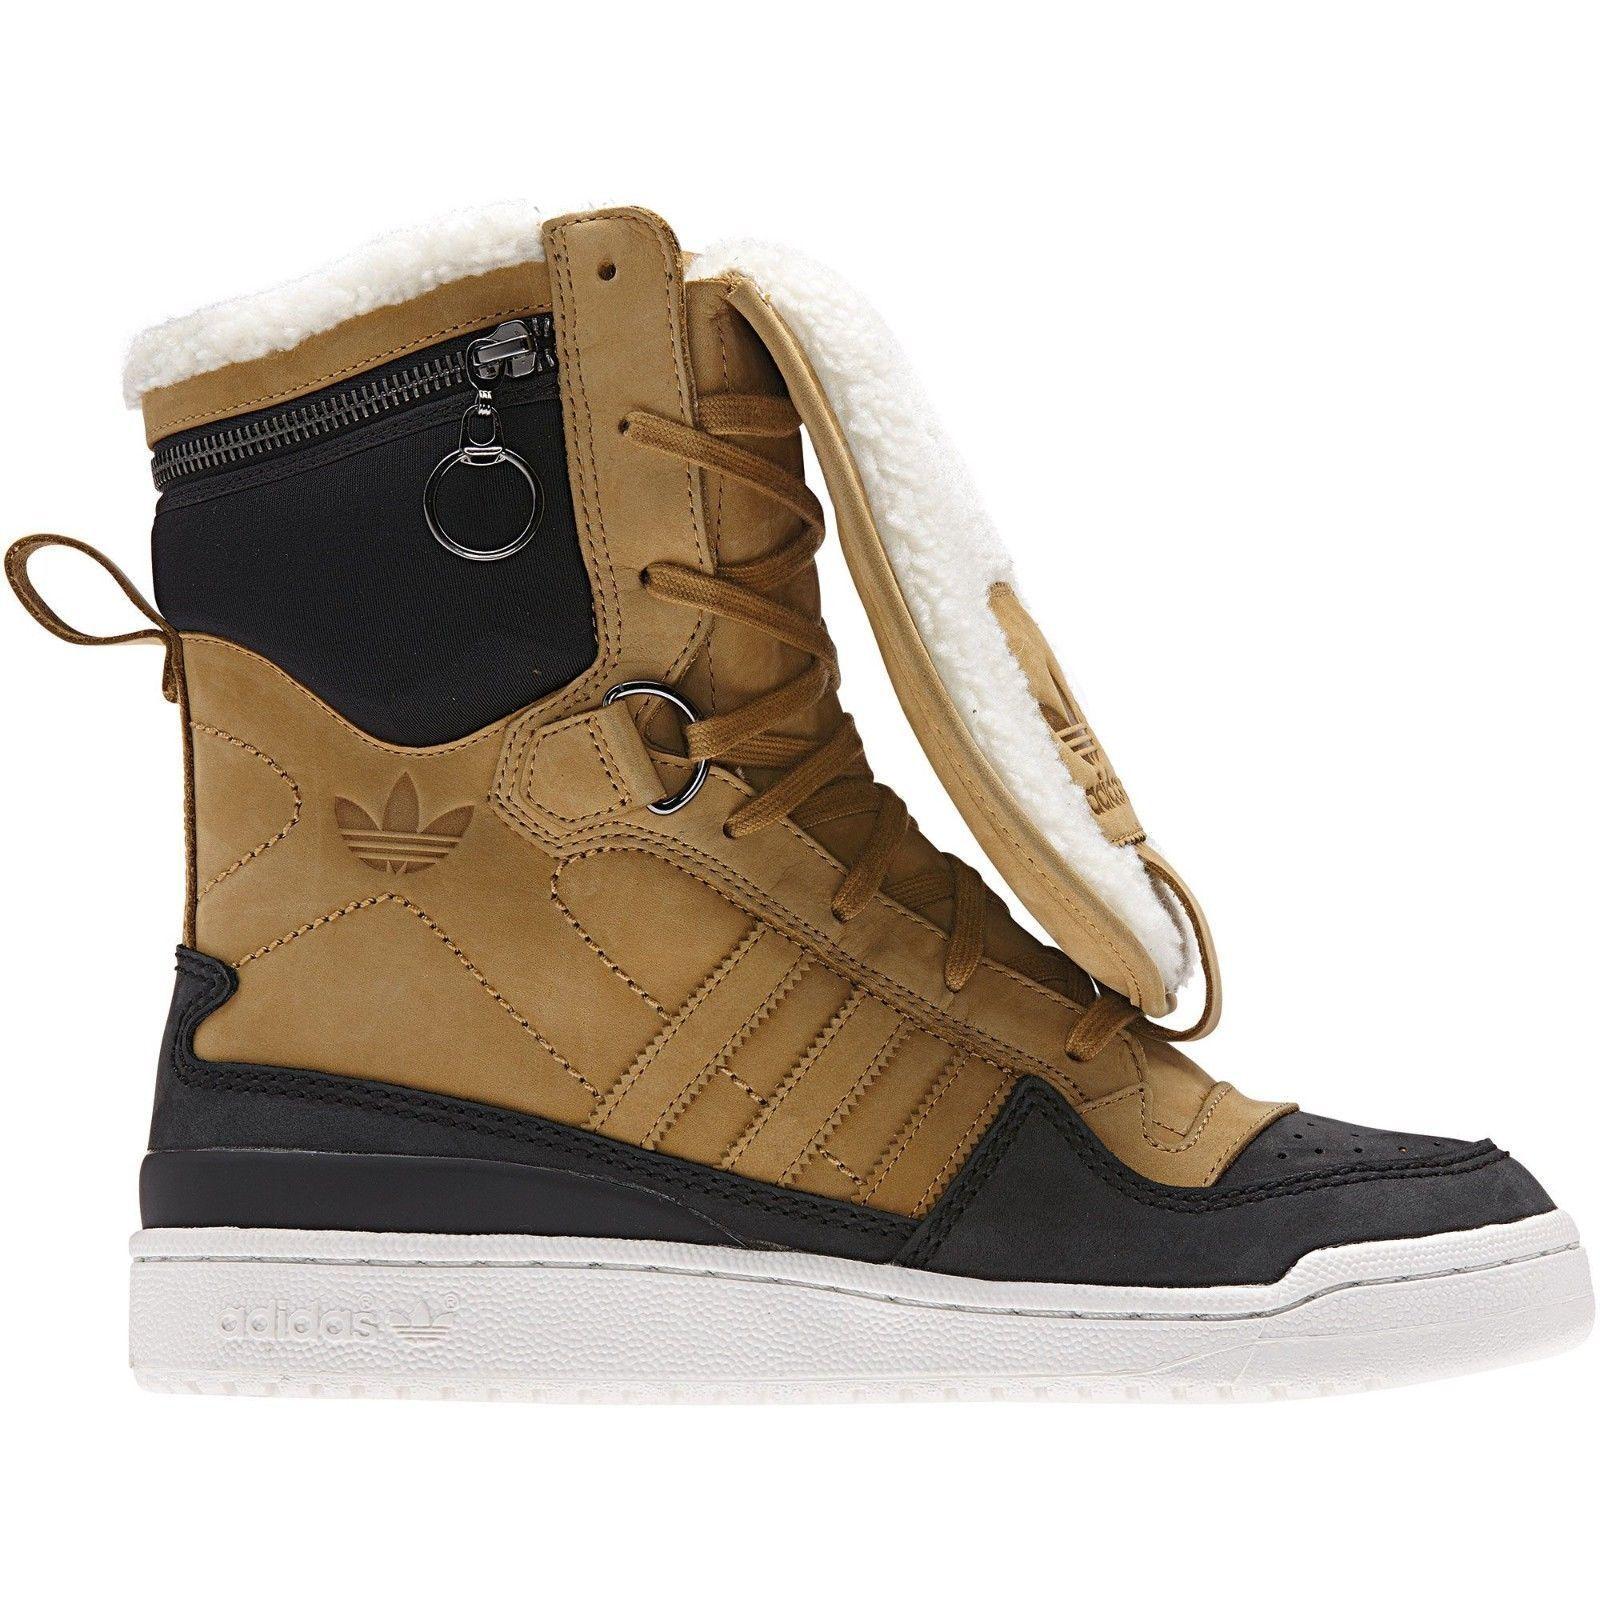 Scarpe casual da uomo  Adidas Originals Jeremy Scott Tall Boy Winter M29009 Limited Edition